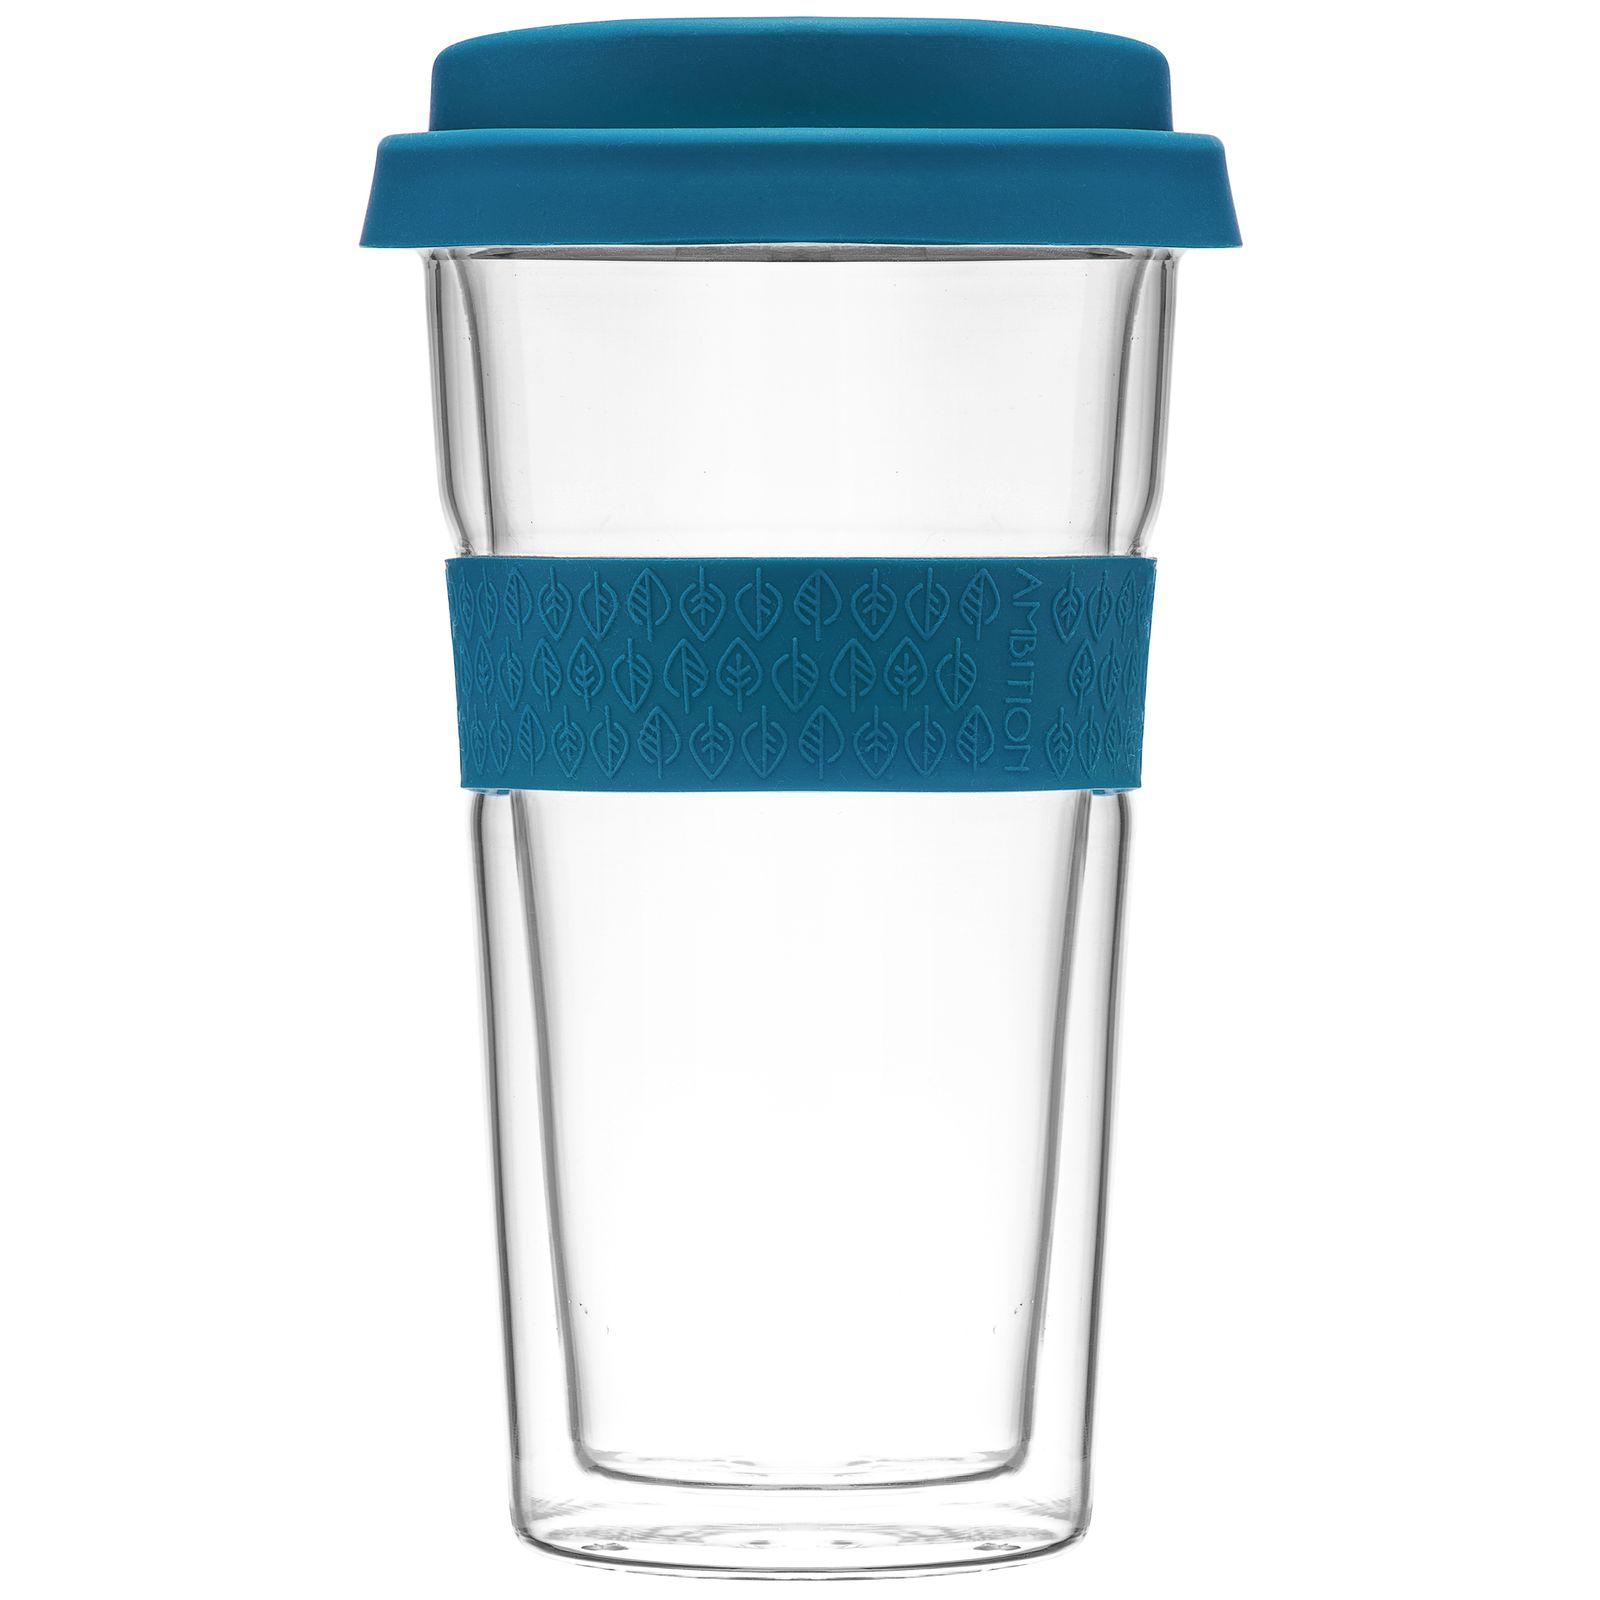 Kubek / szklanka termiczna z opaską Bizet 400 ml Navy Green AMBITION